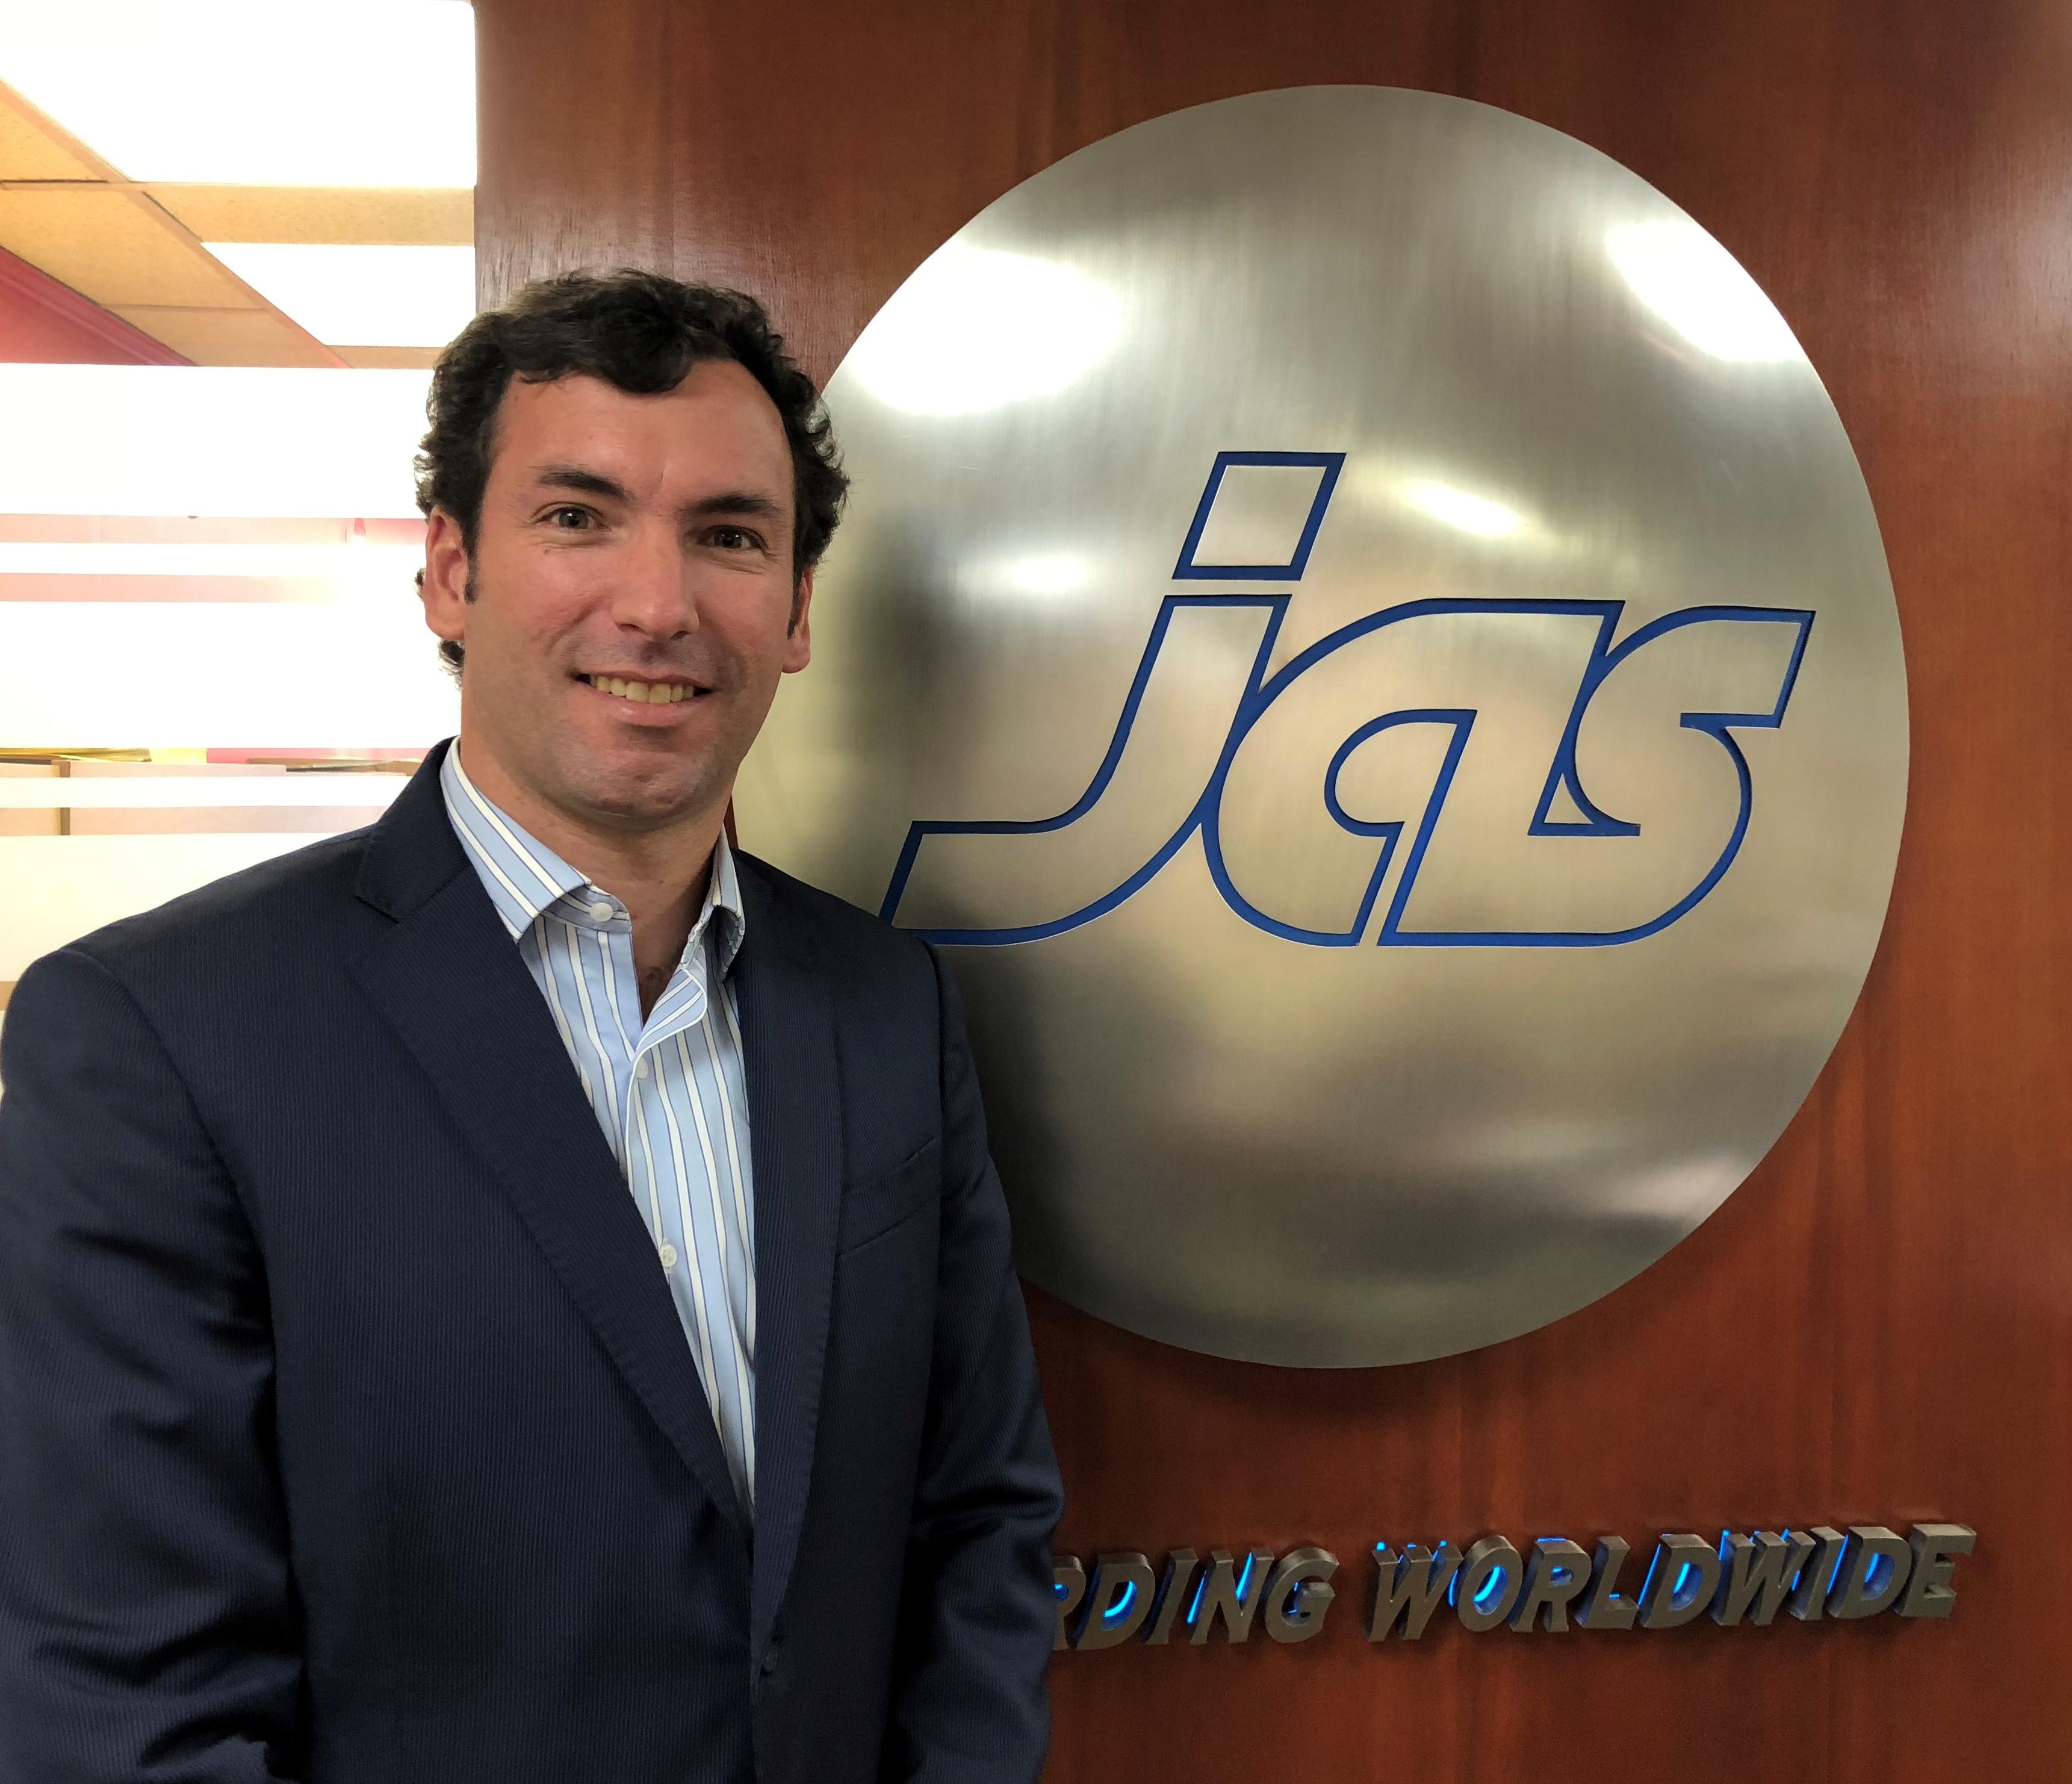 Rodrigo Bustos, JAS Chile Managing Director